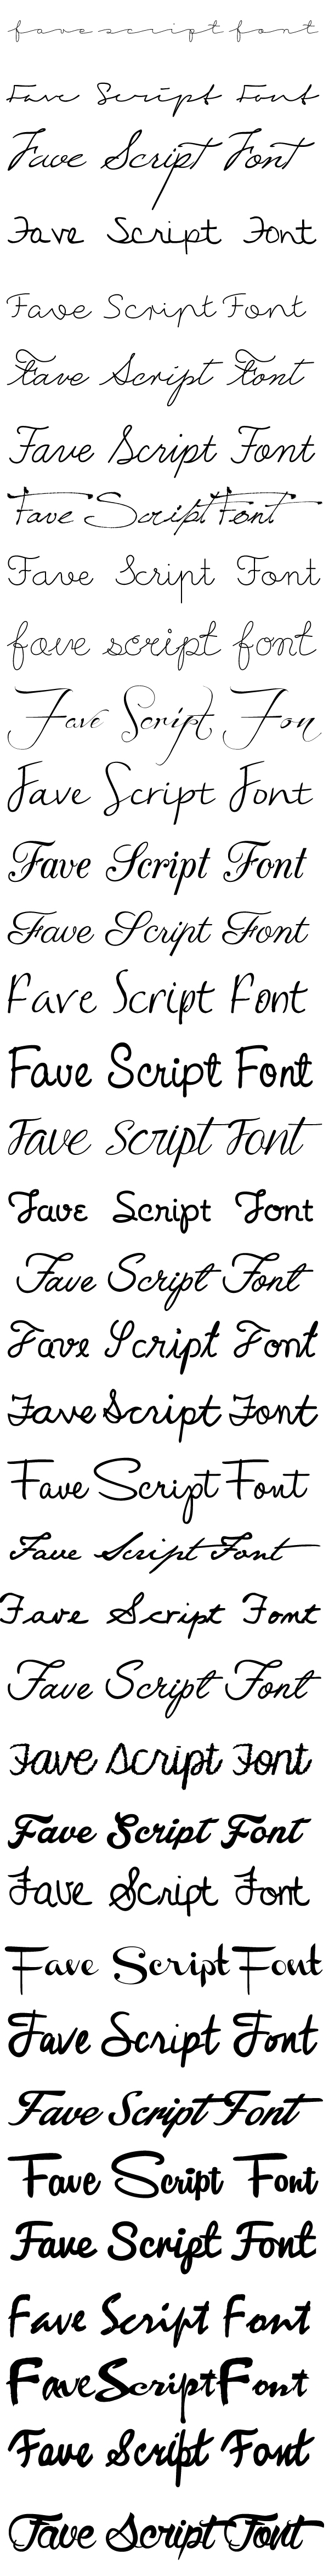 Of Many Parts // Favorite Script Fonts